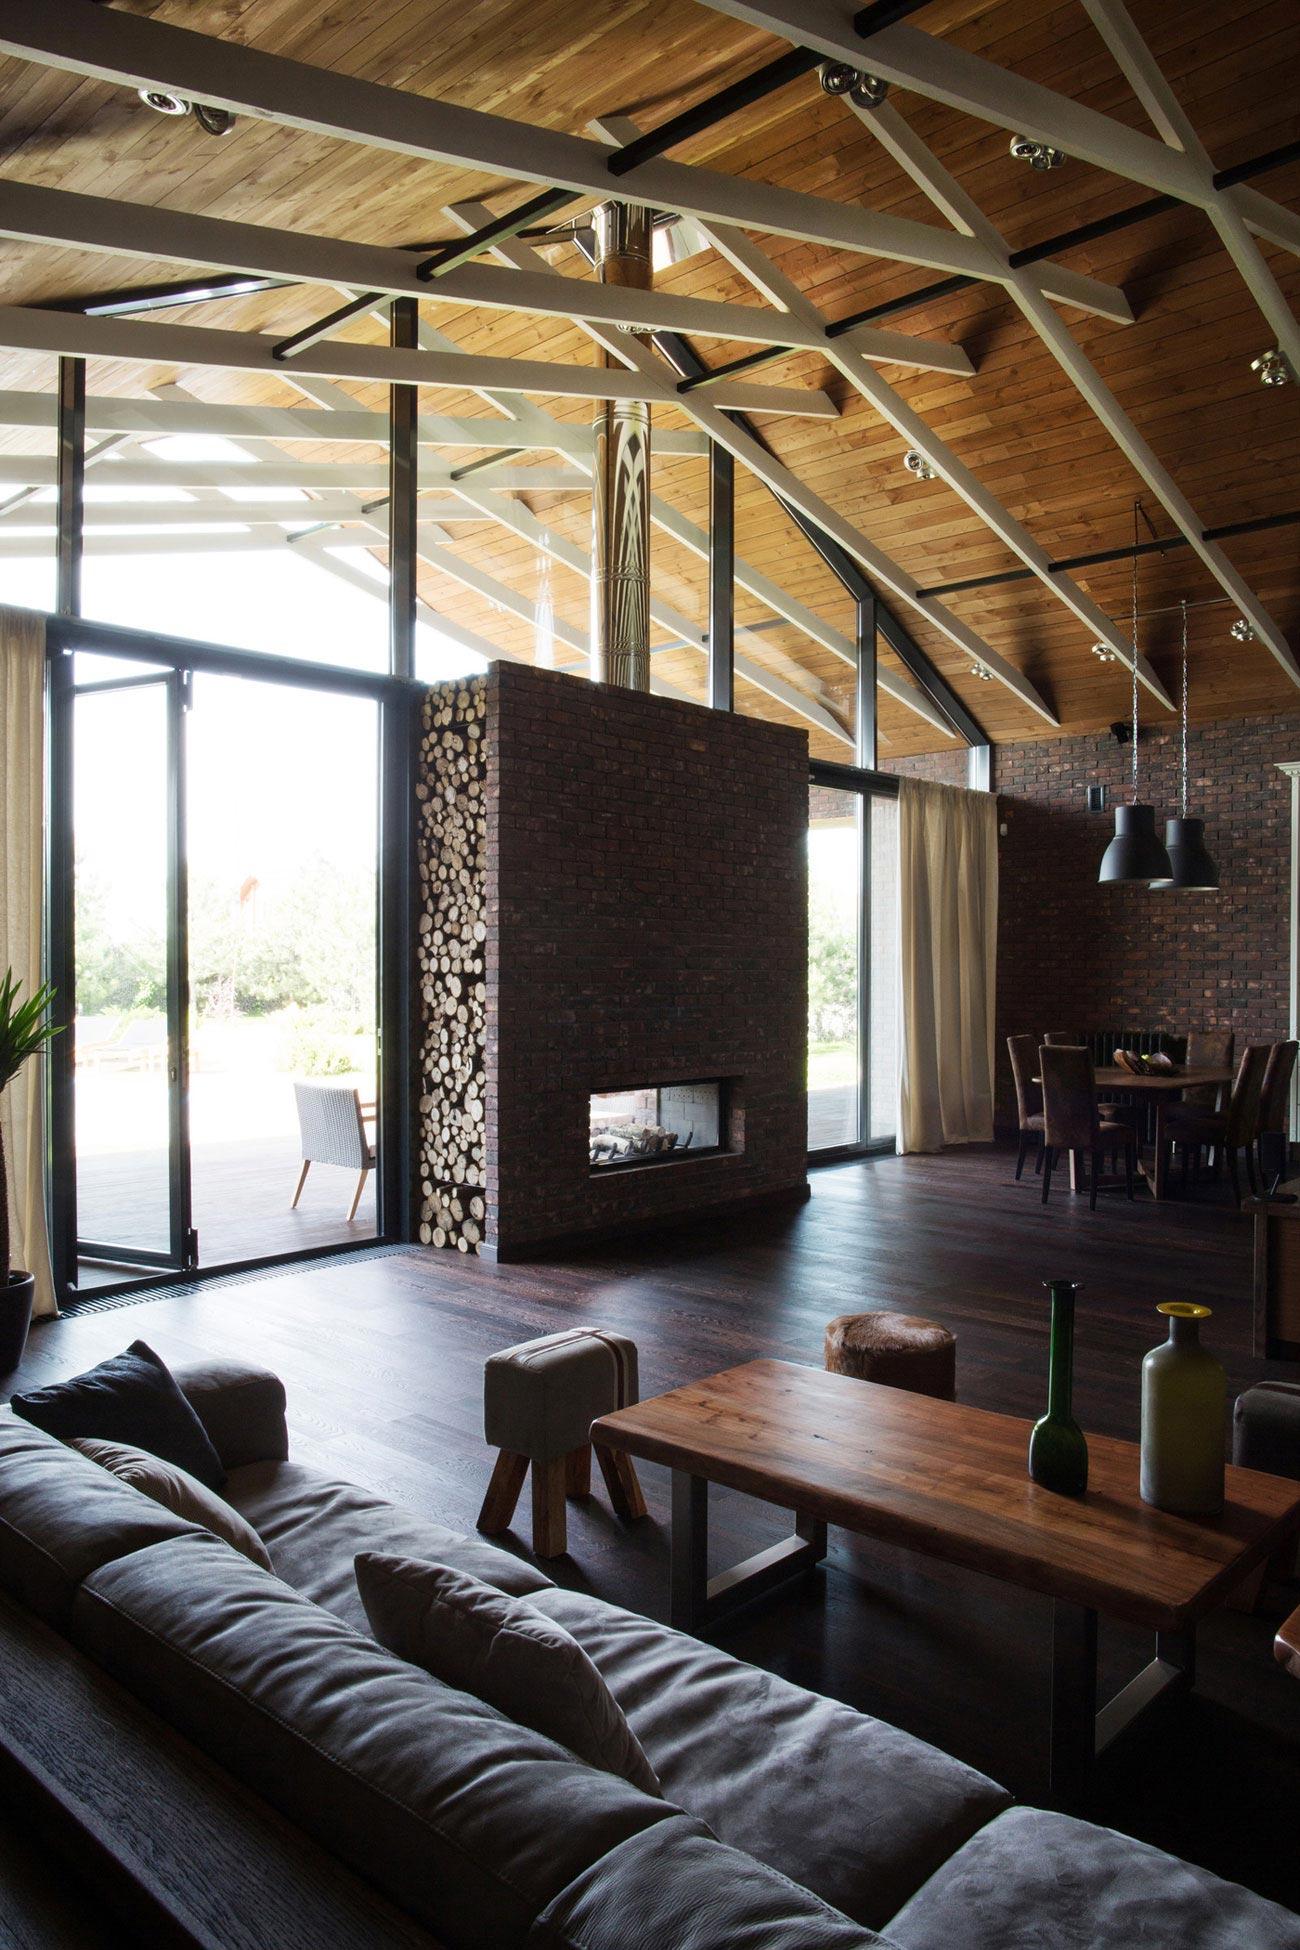 Casa de un piso de 390 metros cuadrados construye hogar for Disenos de interiores para apartamentos